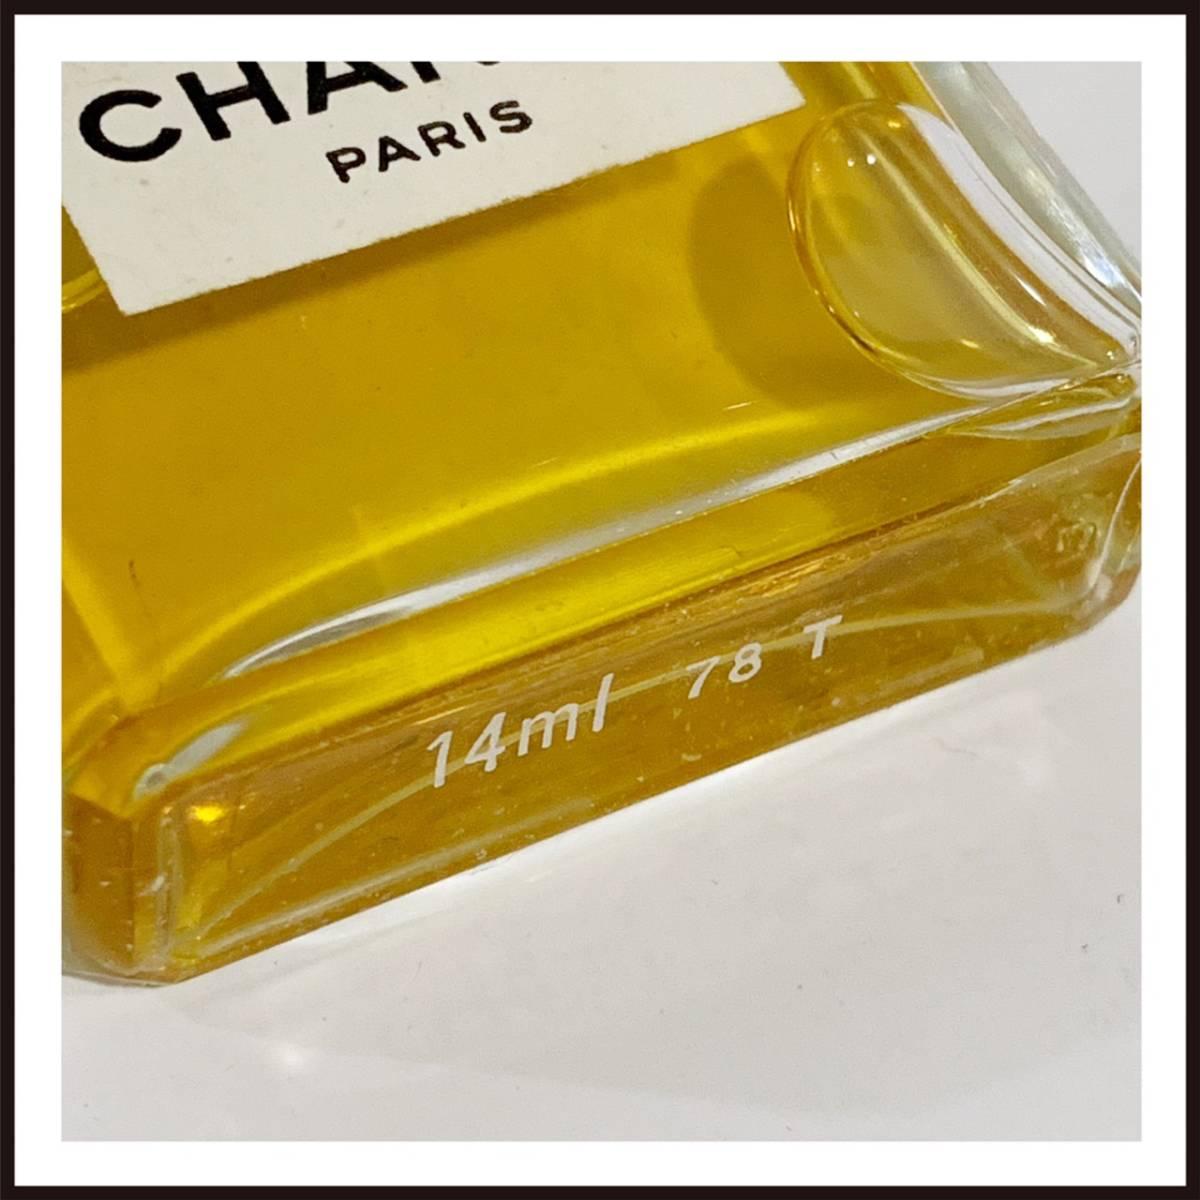 Chanel ★CHANEL★No19 ... Perfume   Perfume ★ 2шт.  комплект  ★ остаток  до верха  почти  ...